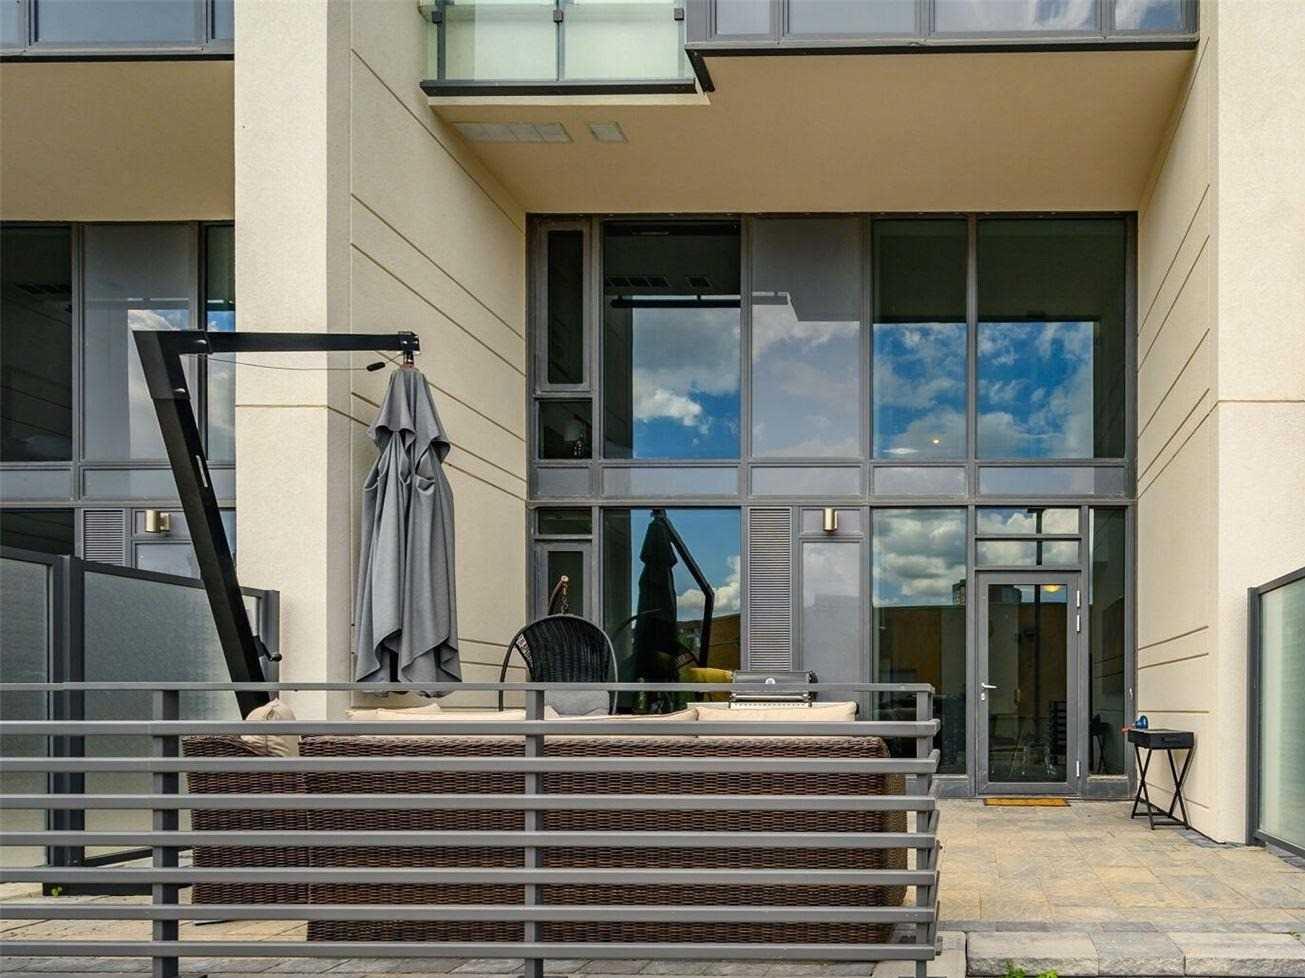 Condo Townhouse For Sale In Richmond Hill , 2 Bedrooms Bedrooms, ,3 BathroomsBathrooms,Condo Townhouse,For Sale,101,Yonge